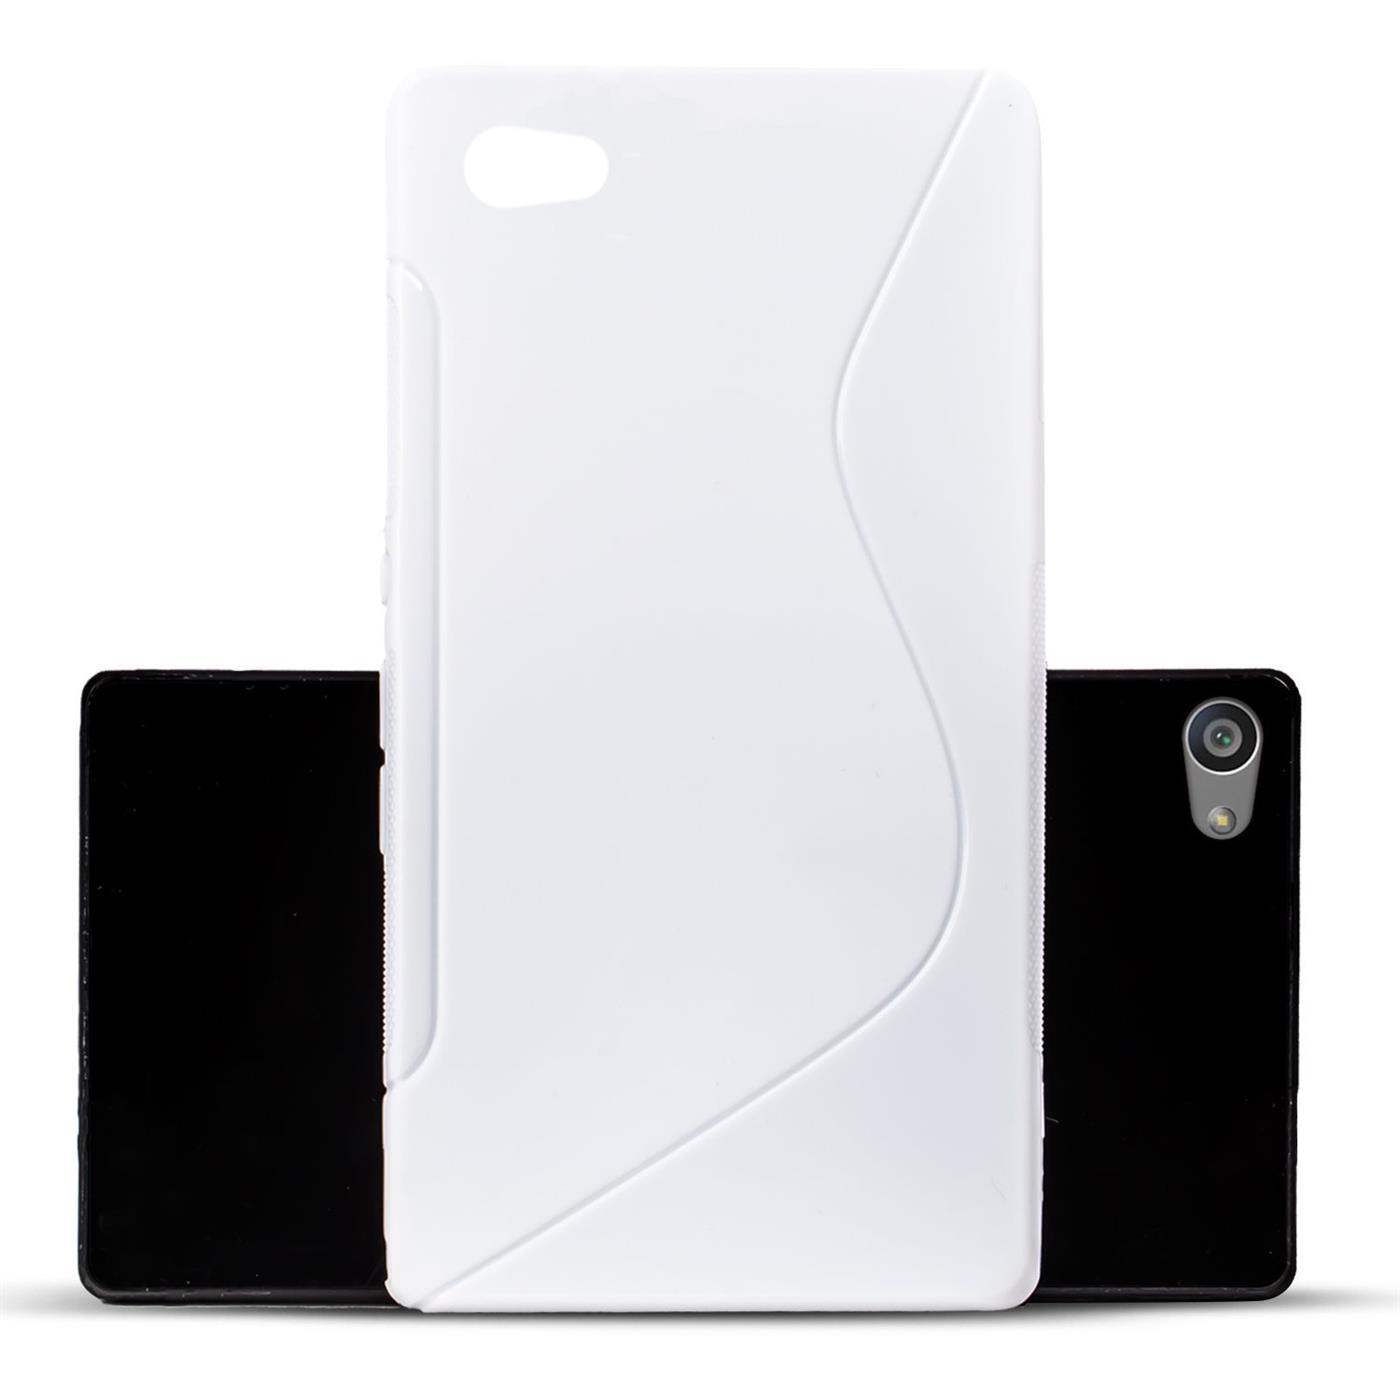 Sony-Xperia-X-Silikon-Gel-S-Line-Case-Cover-Ultra-Thin-Slim-Back-Bumper Indexbild 30